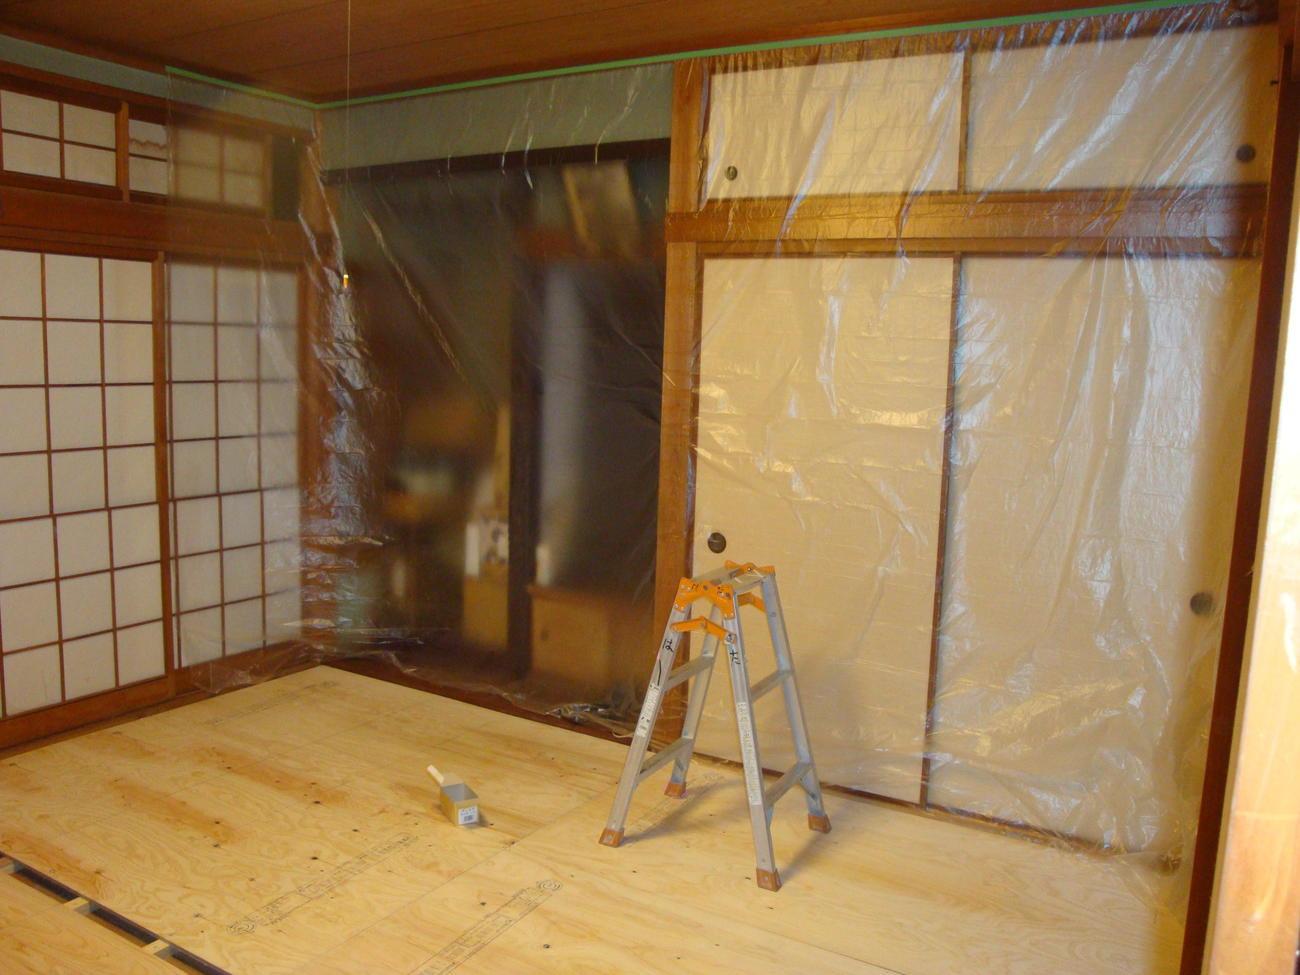 https://yamasakikenzai.co.jp/topics/images/DSC09770.JPG